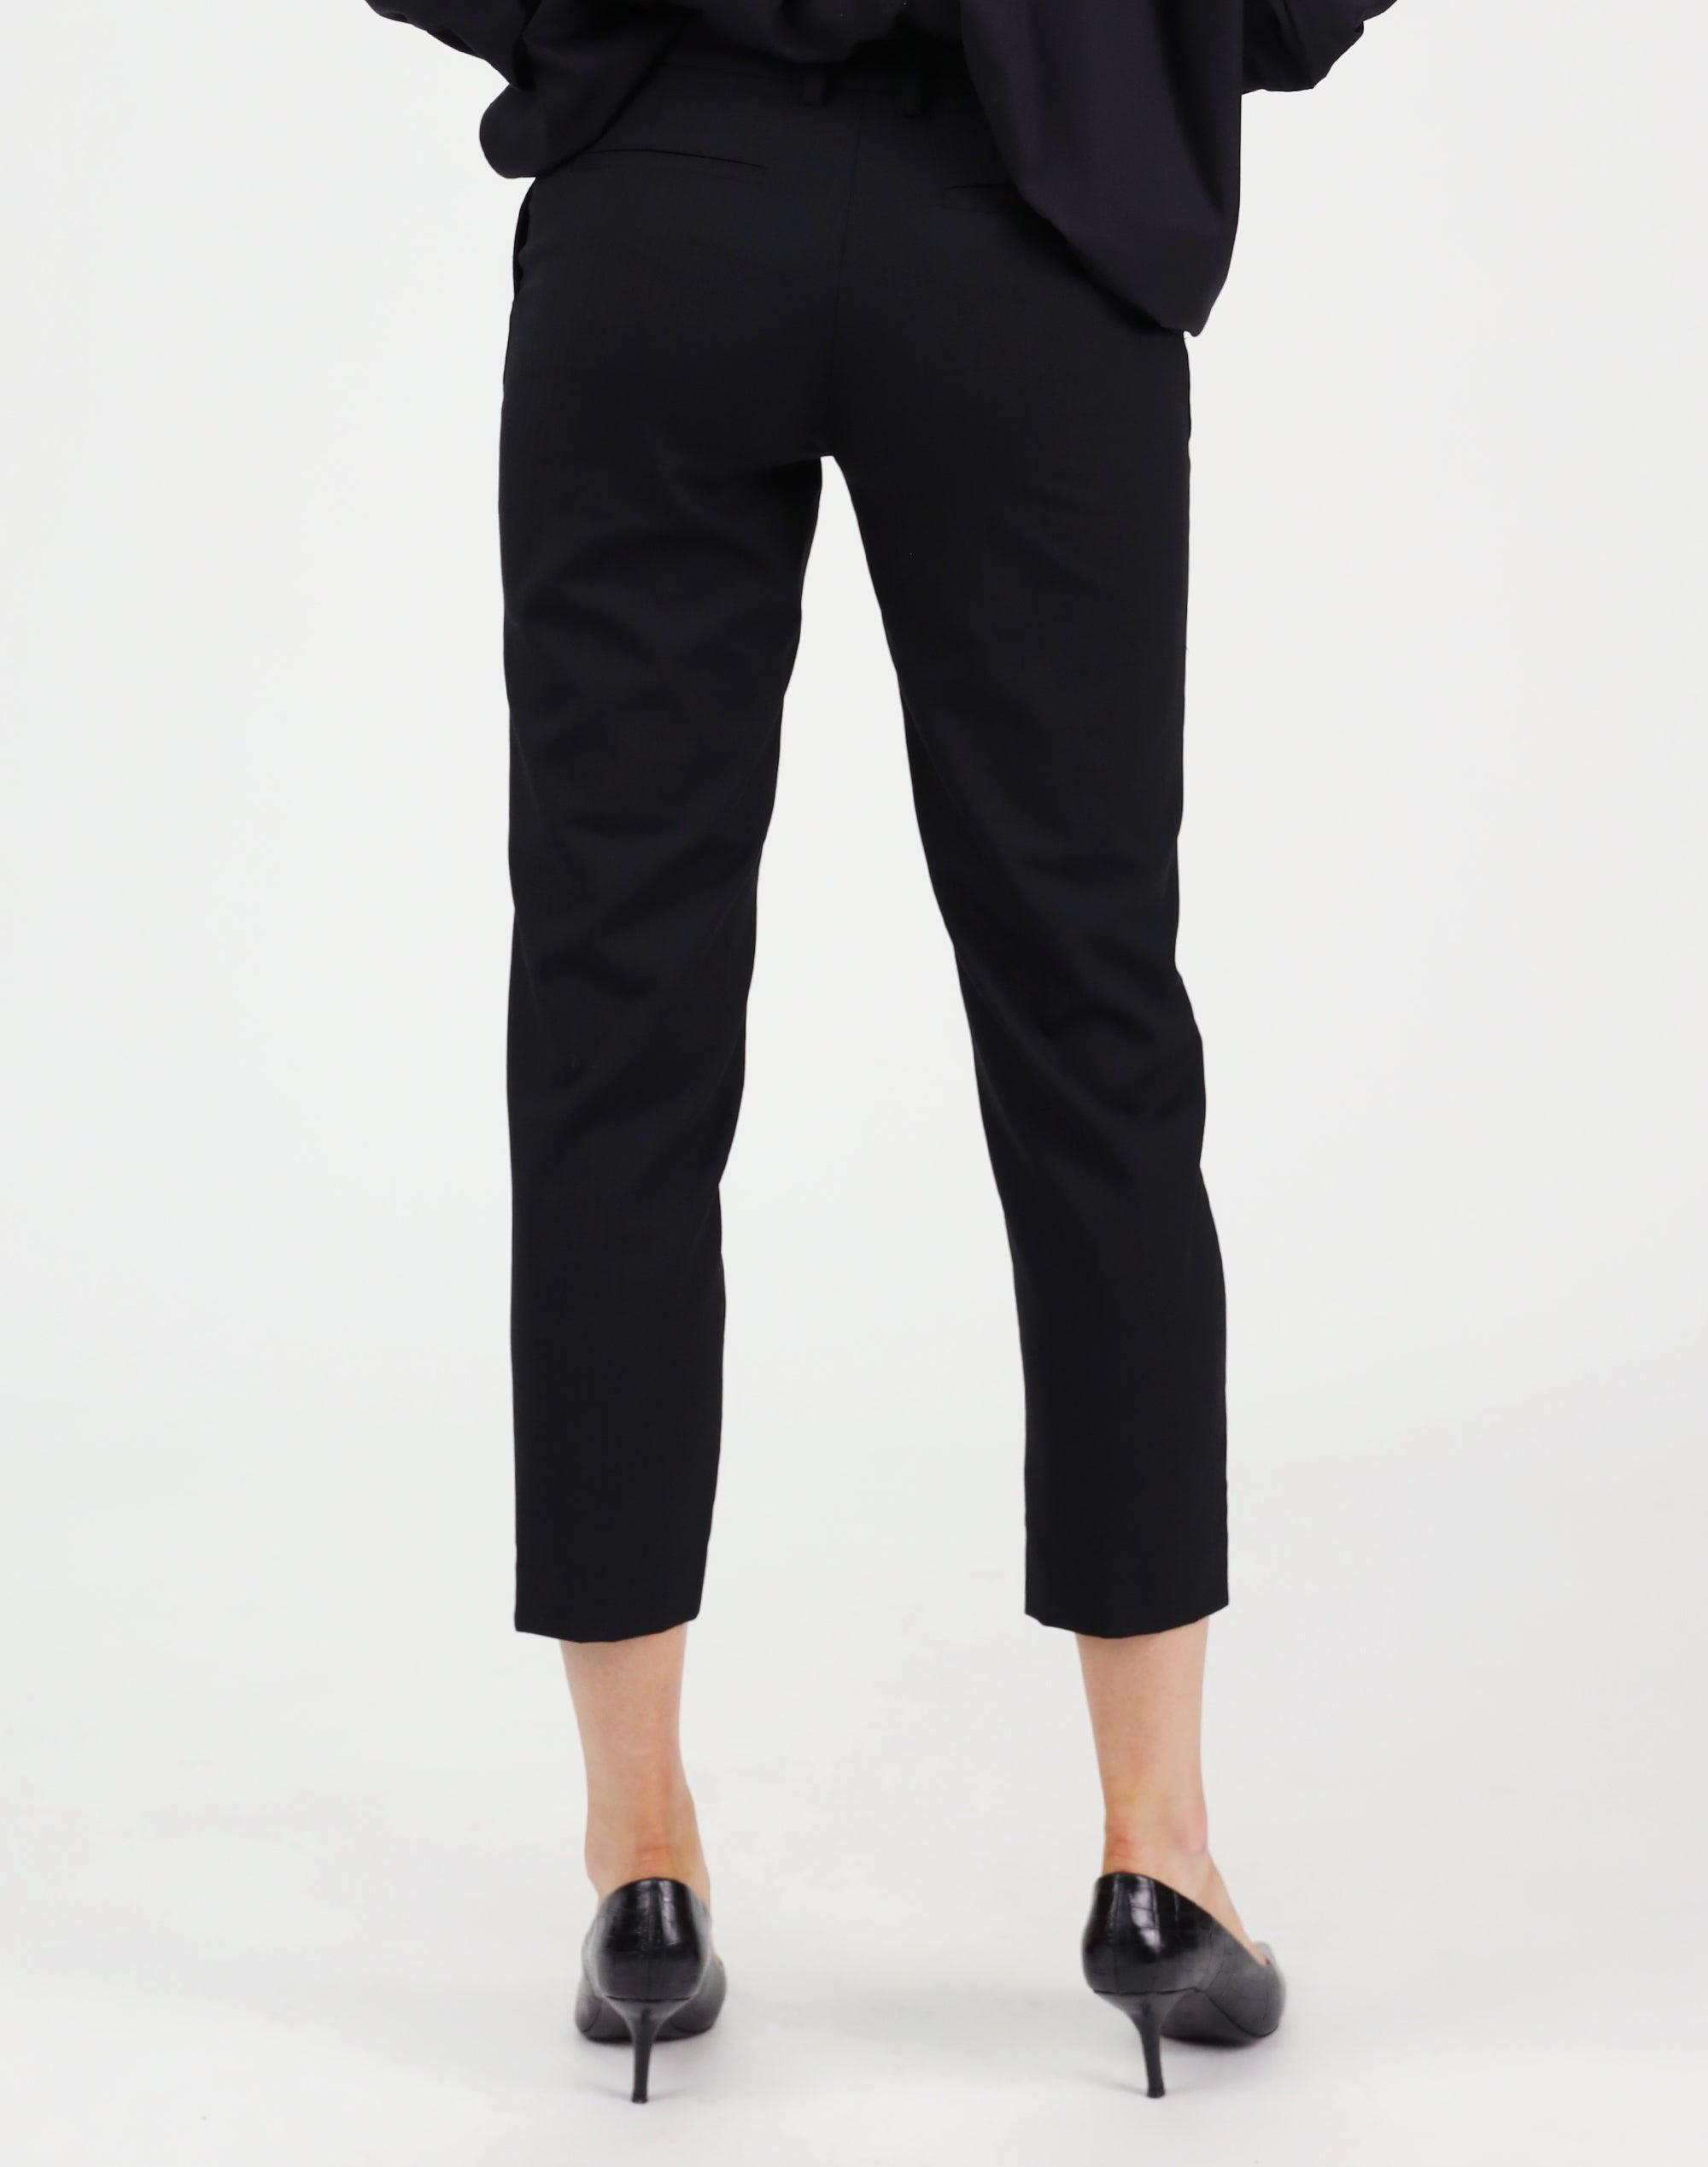 Dark Pinstripe Pant